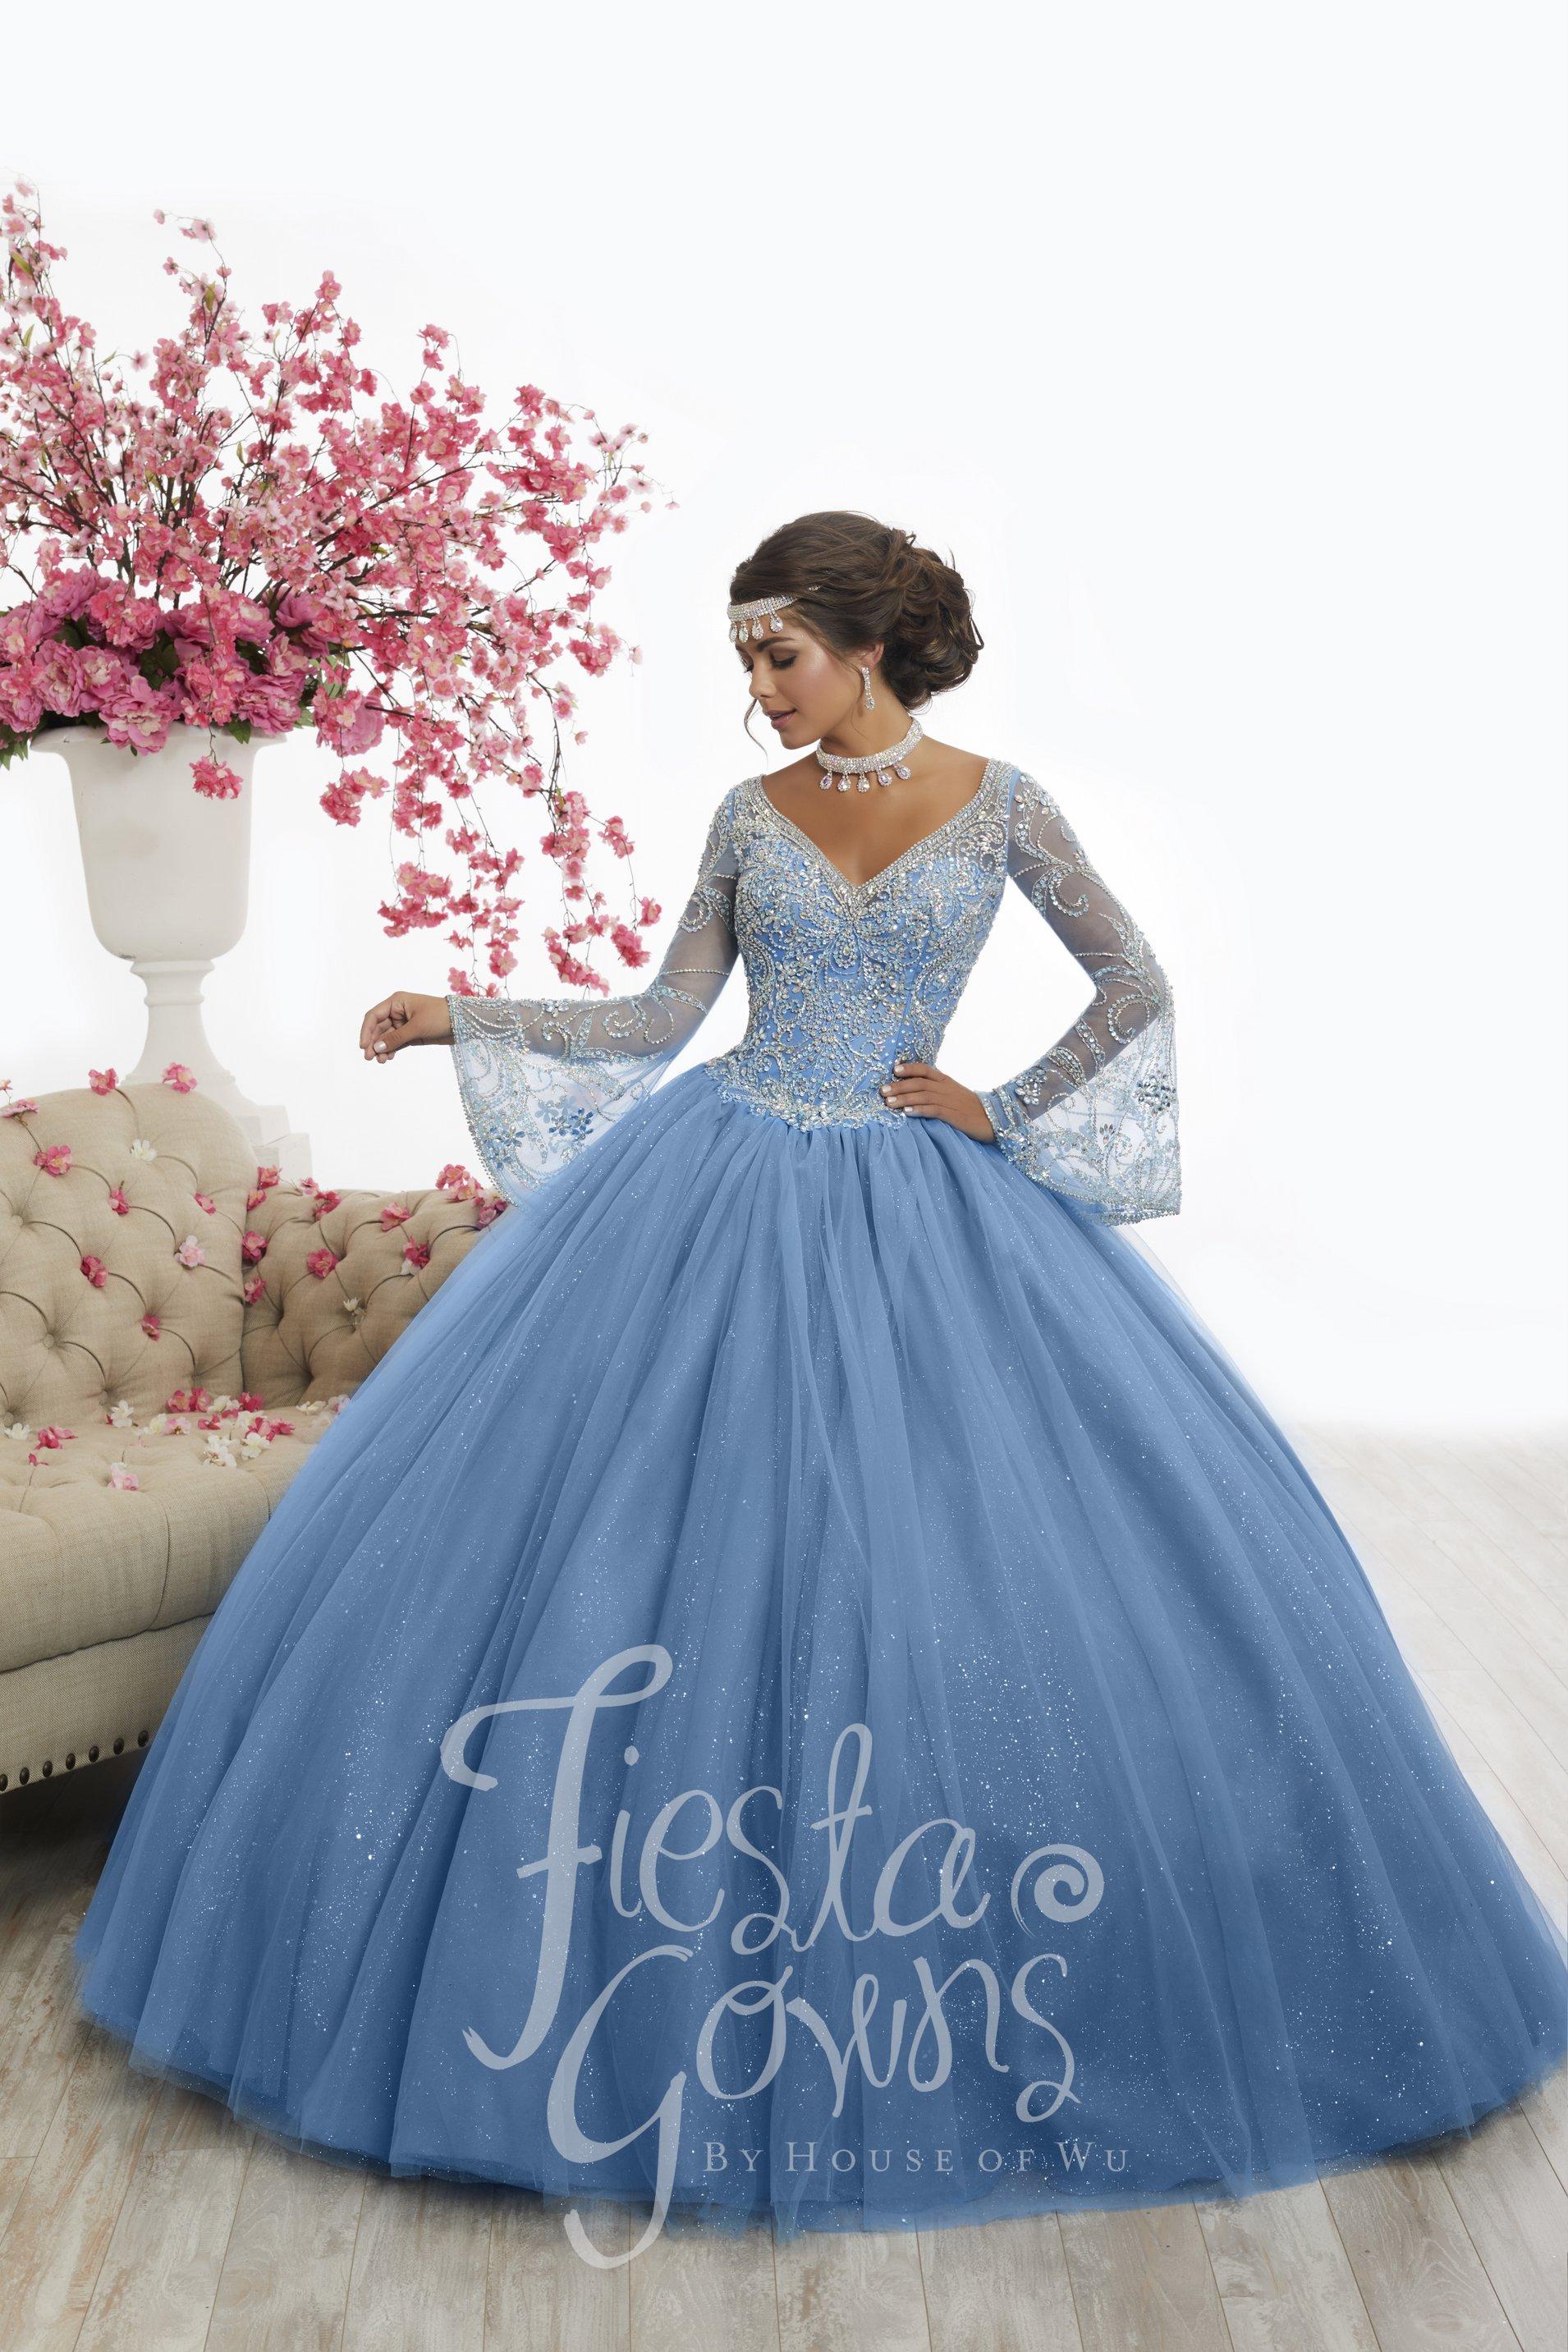 d6d4b9d2f47 Vestido de Debutante Longo Fiesta Gowns 56346 - Moda Mundo